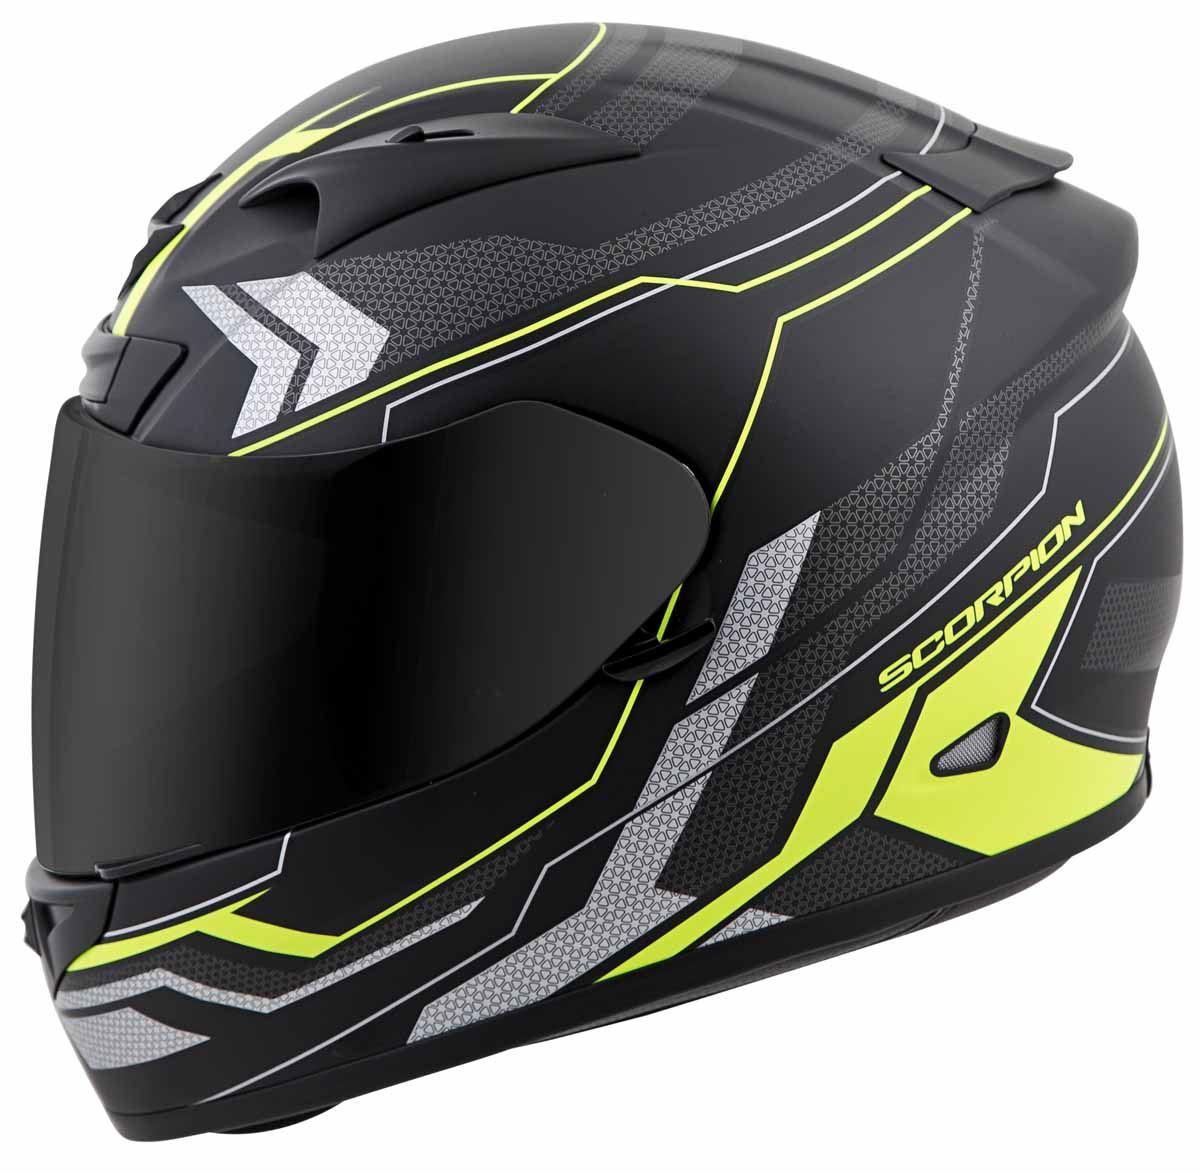 Scorpion-EXO-R710-Helmet-Fiberglass-Full-Face-DOT-SNELL-M2015-Certified-XS-2XL miniature 29